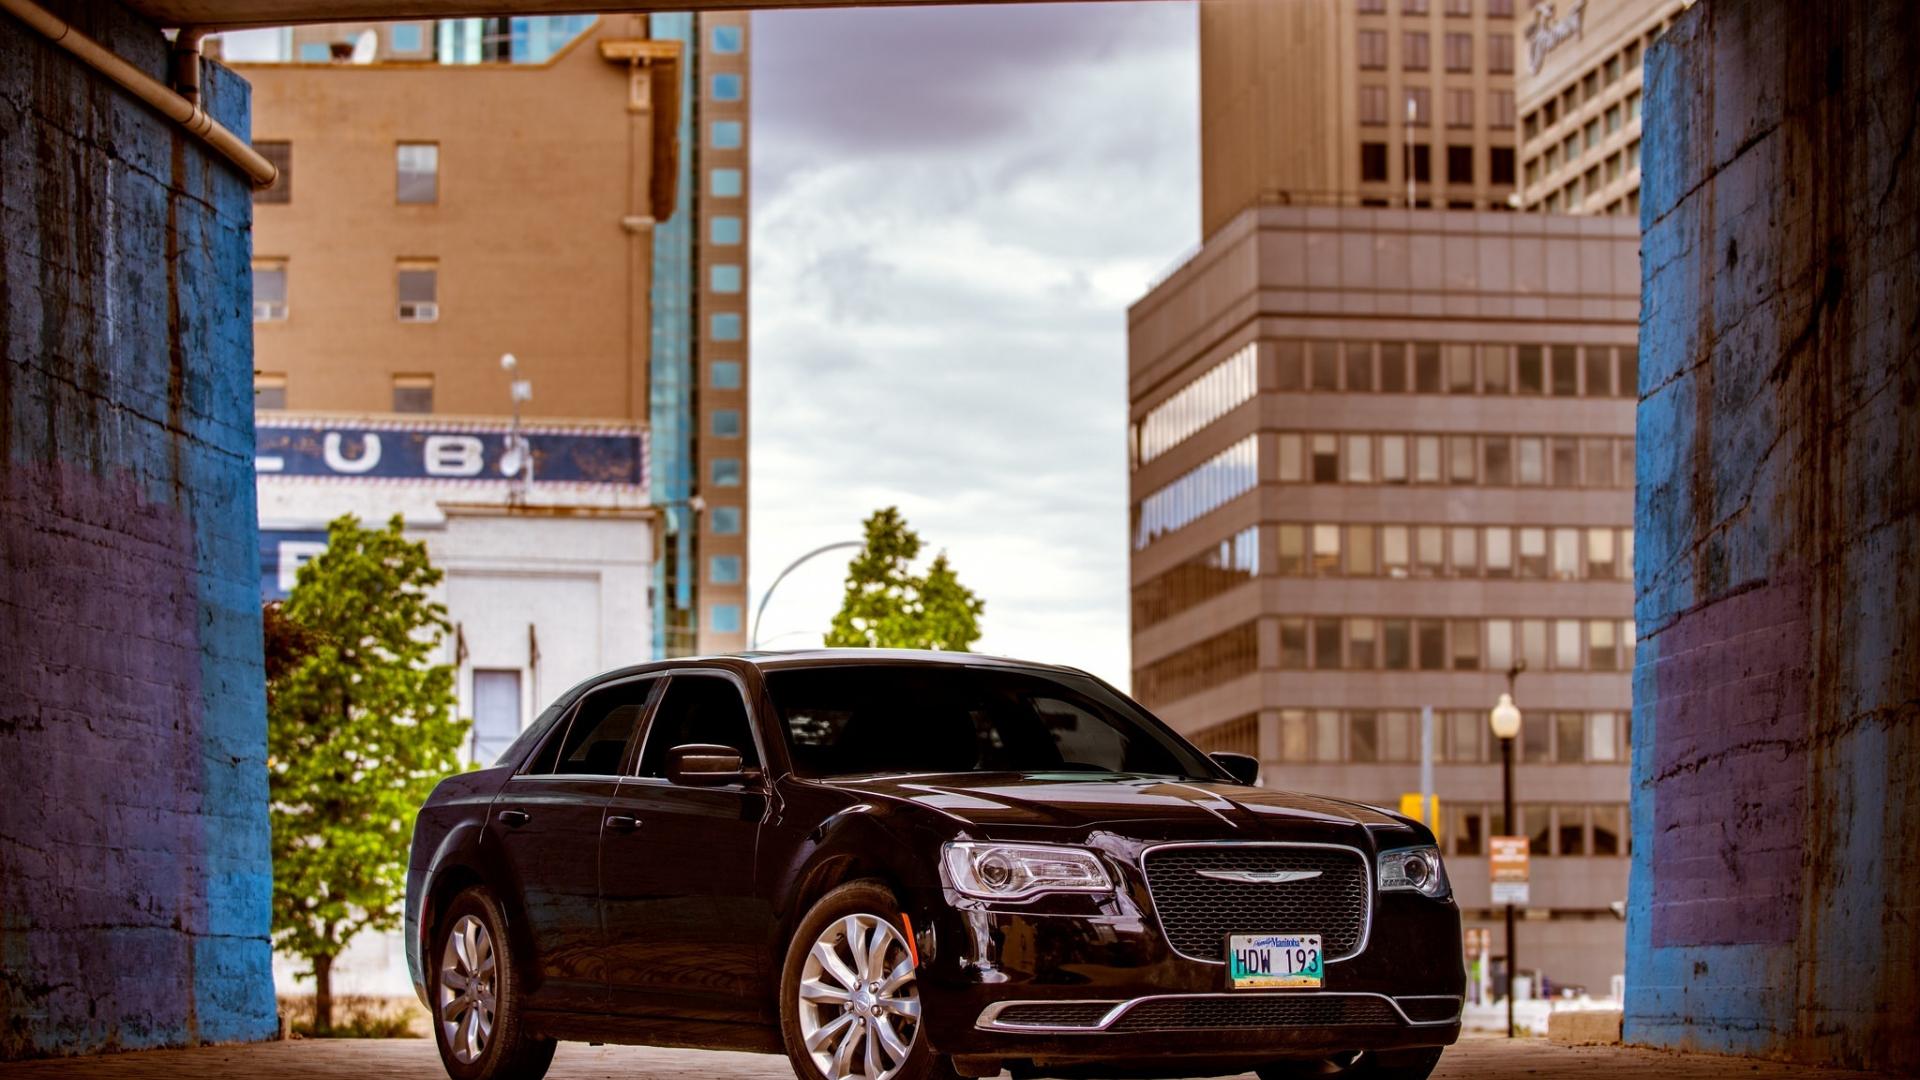 Download 1920x1080 Wallpaper 2018 Chrysler 300 Black Car Full Hd Hdtv Fhd 1080p 1920x1080 Hd Image Background 8731